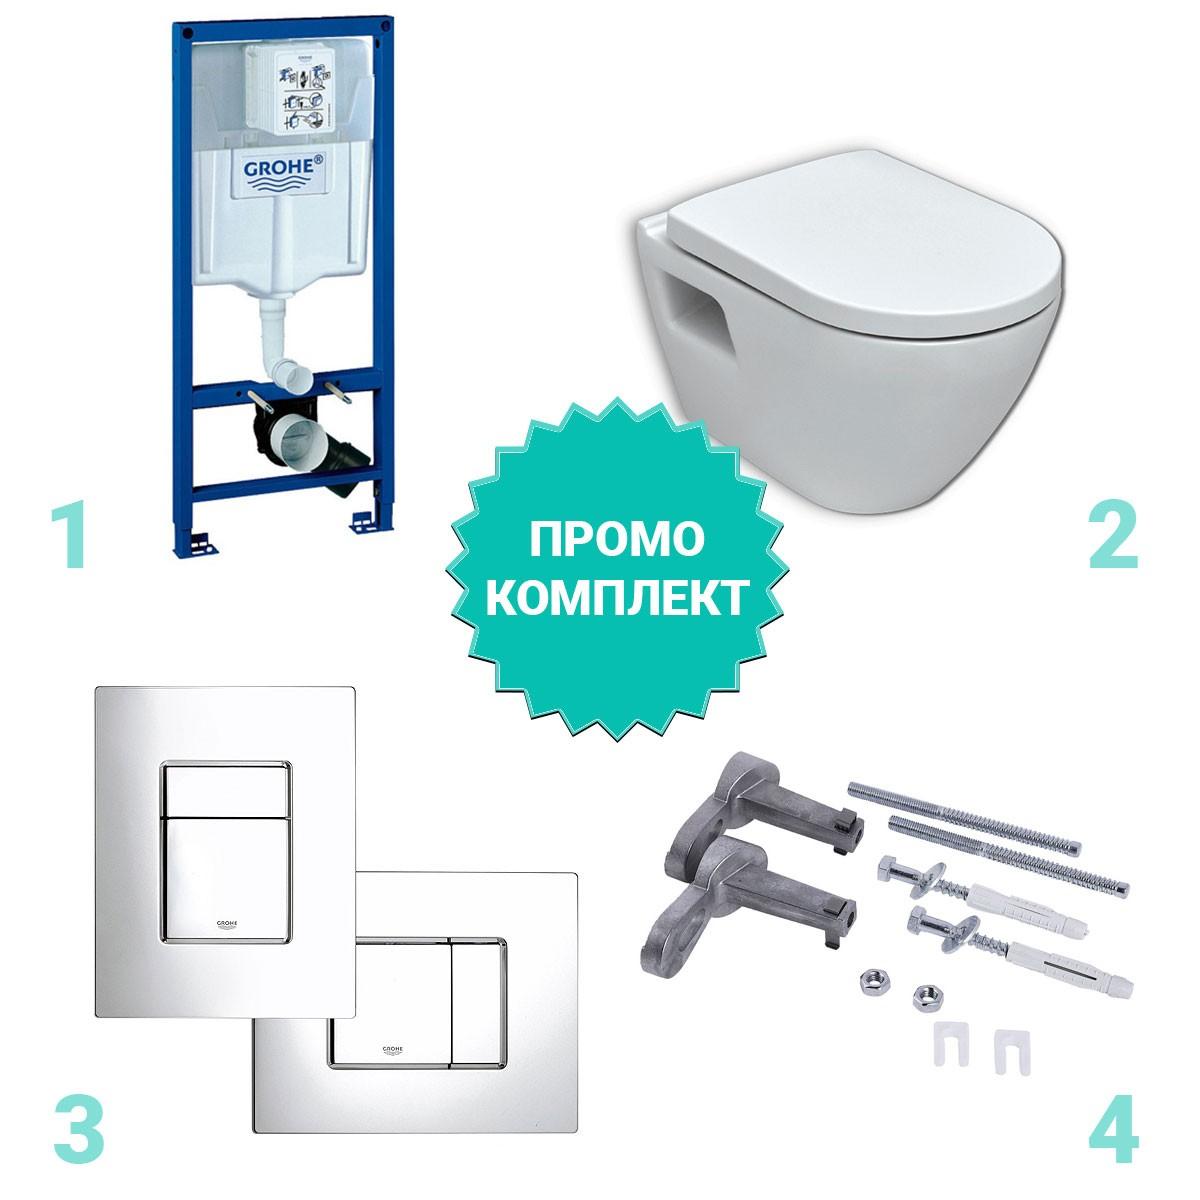 serel-promo-komplekt-vgrajdane-konzolna-toaletna-chinia-01